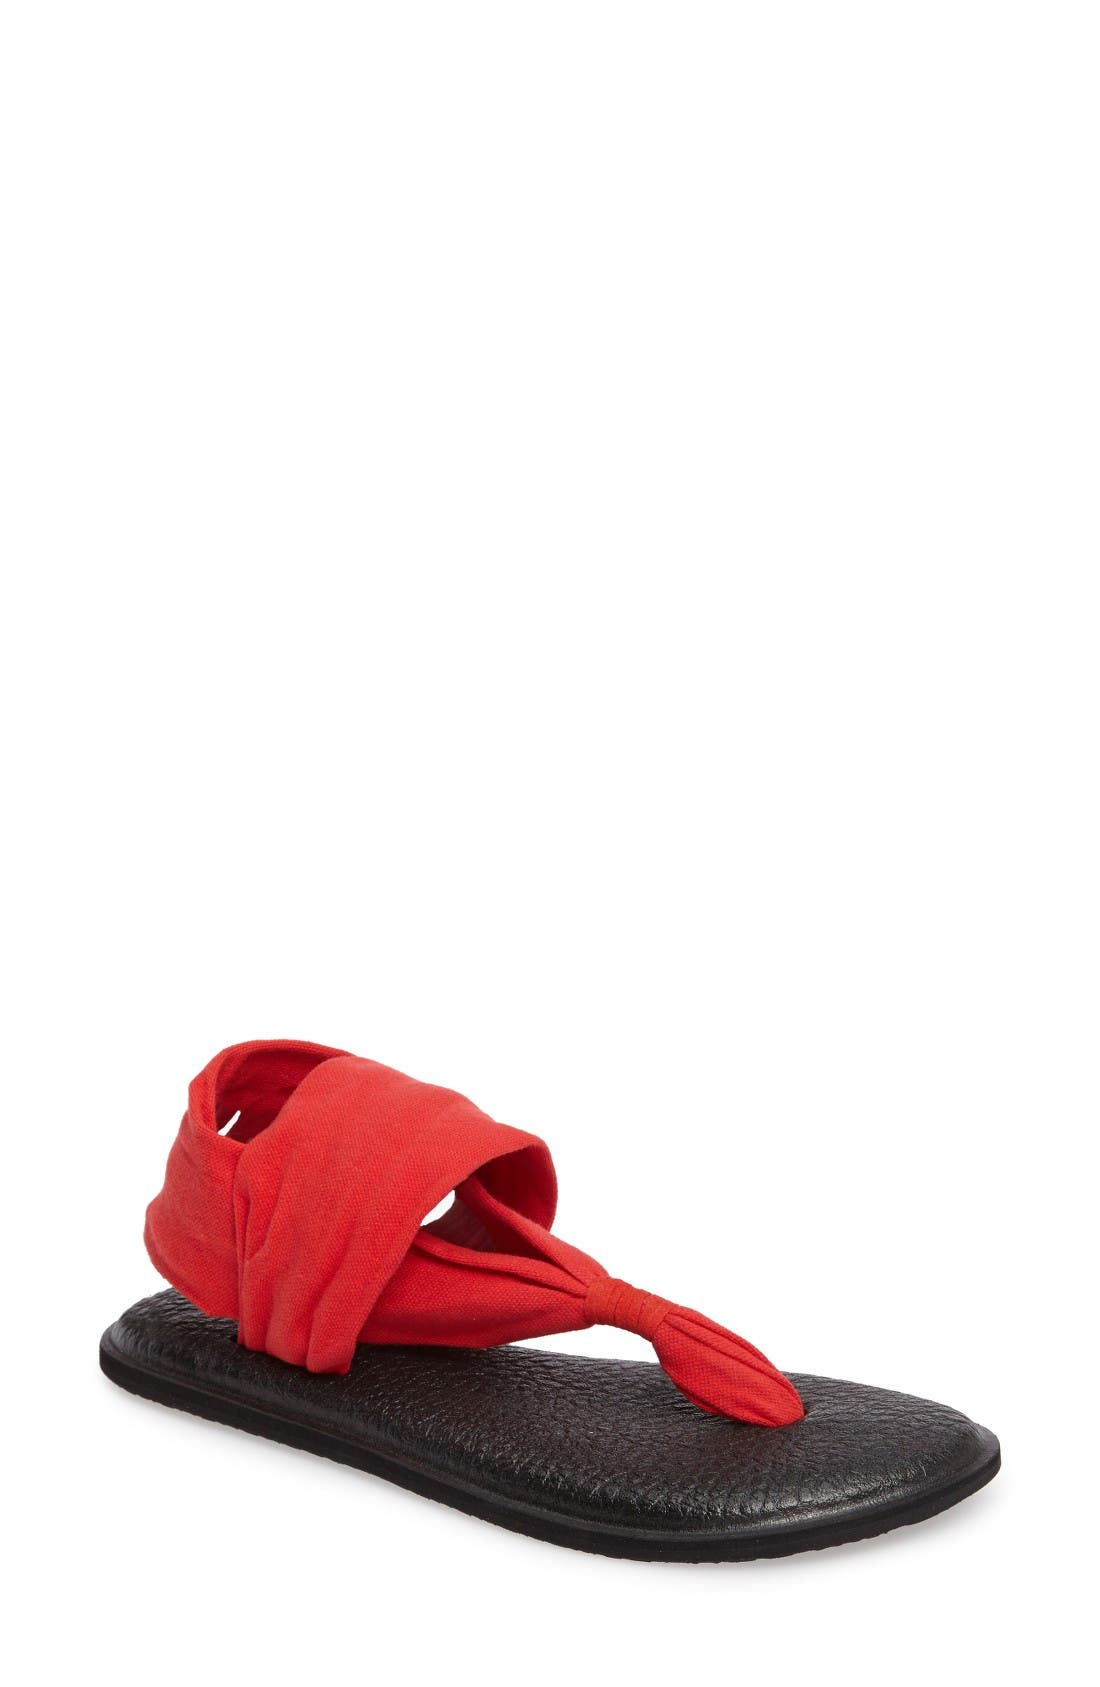 Main Image - Sanuk 'Yoga Sling 2' Sandal (Women)